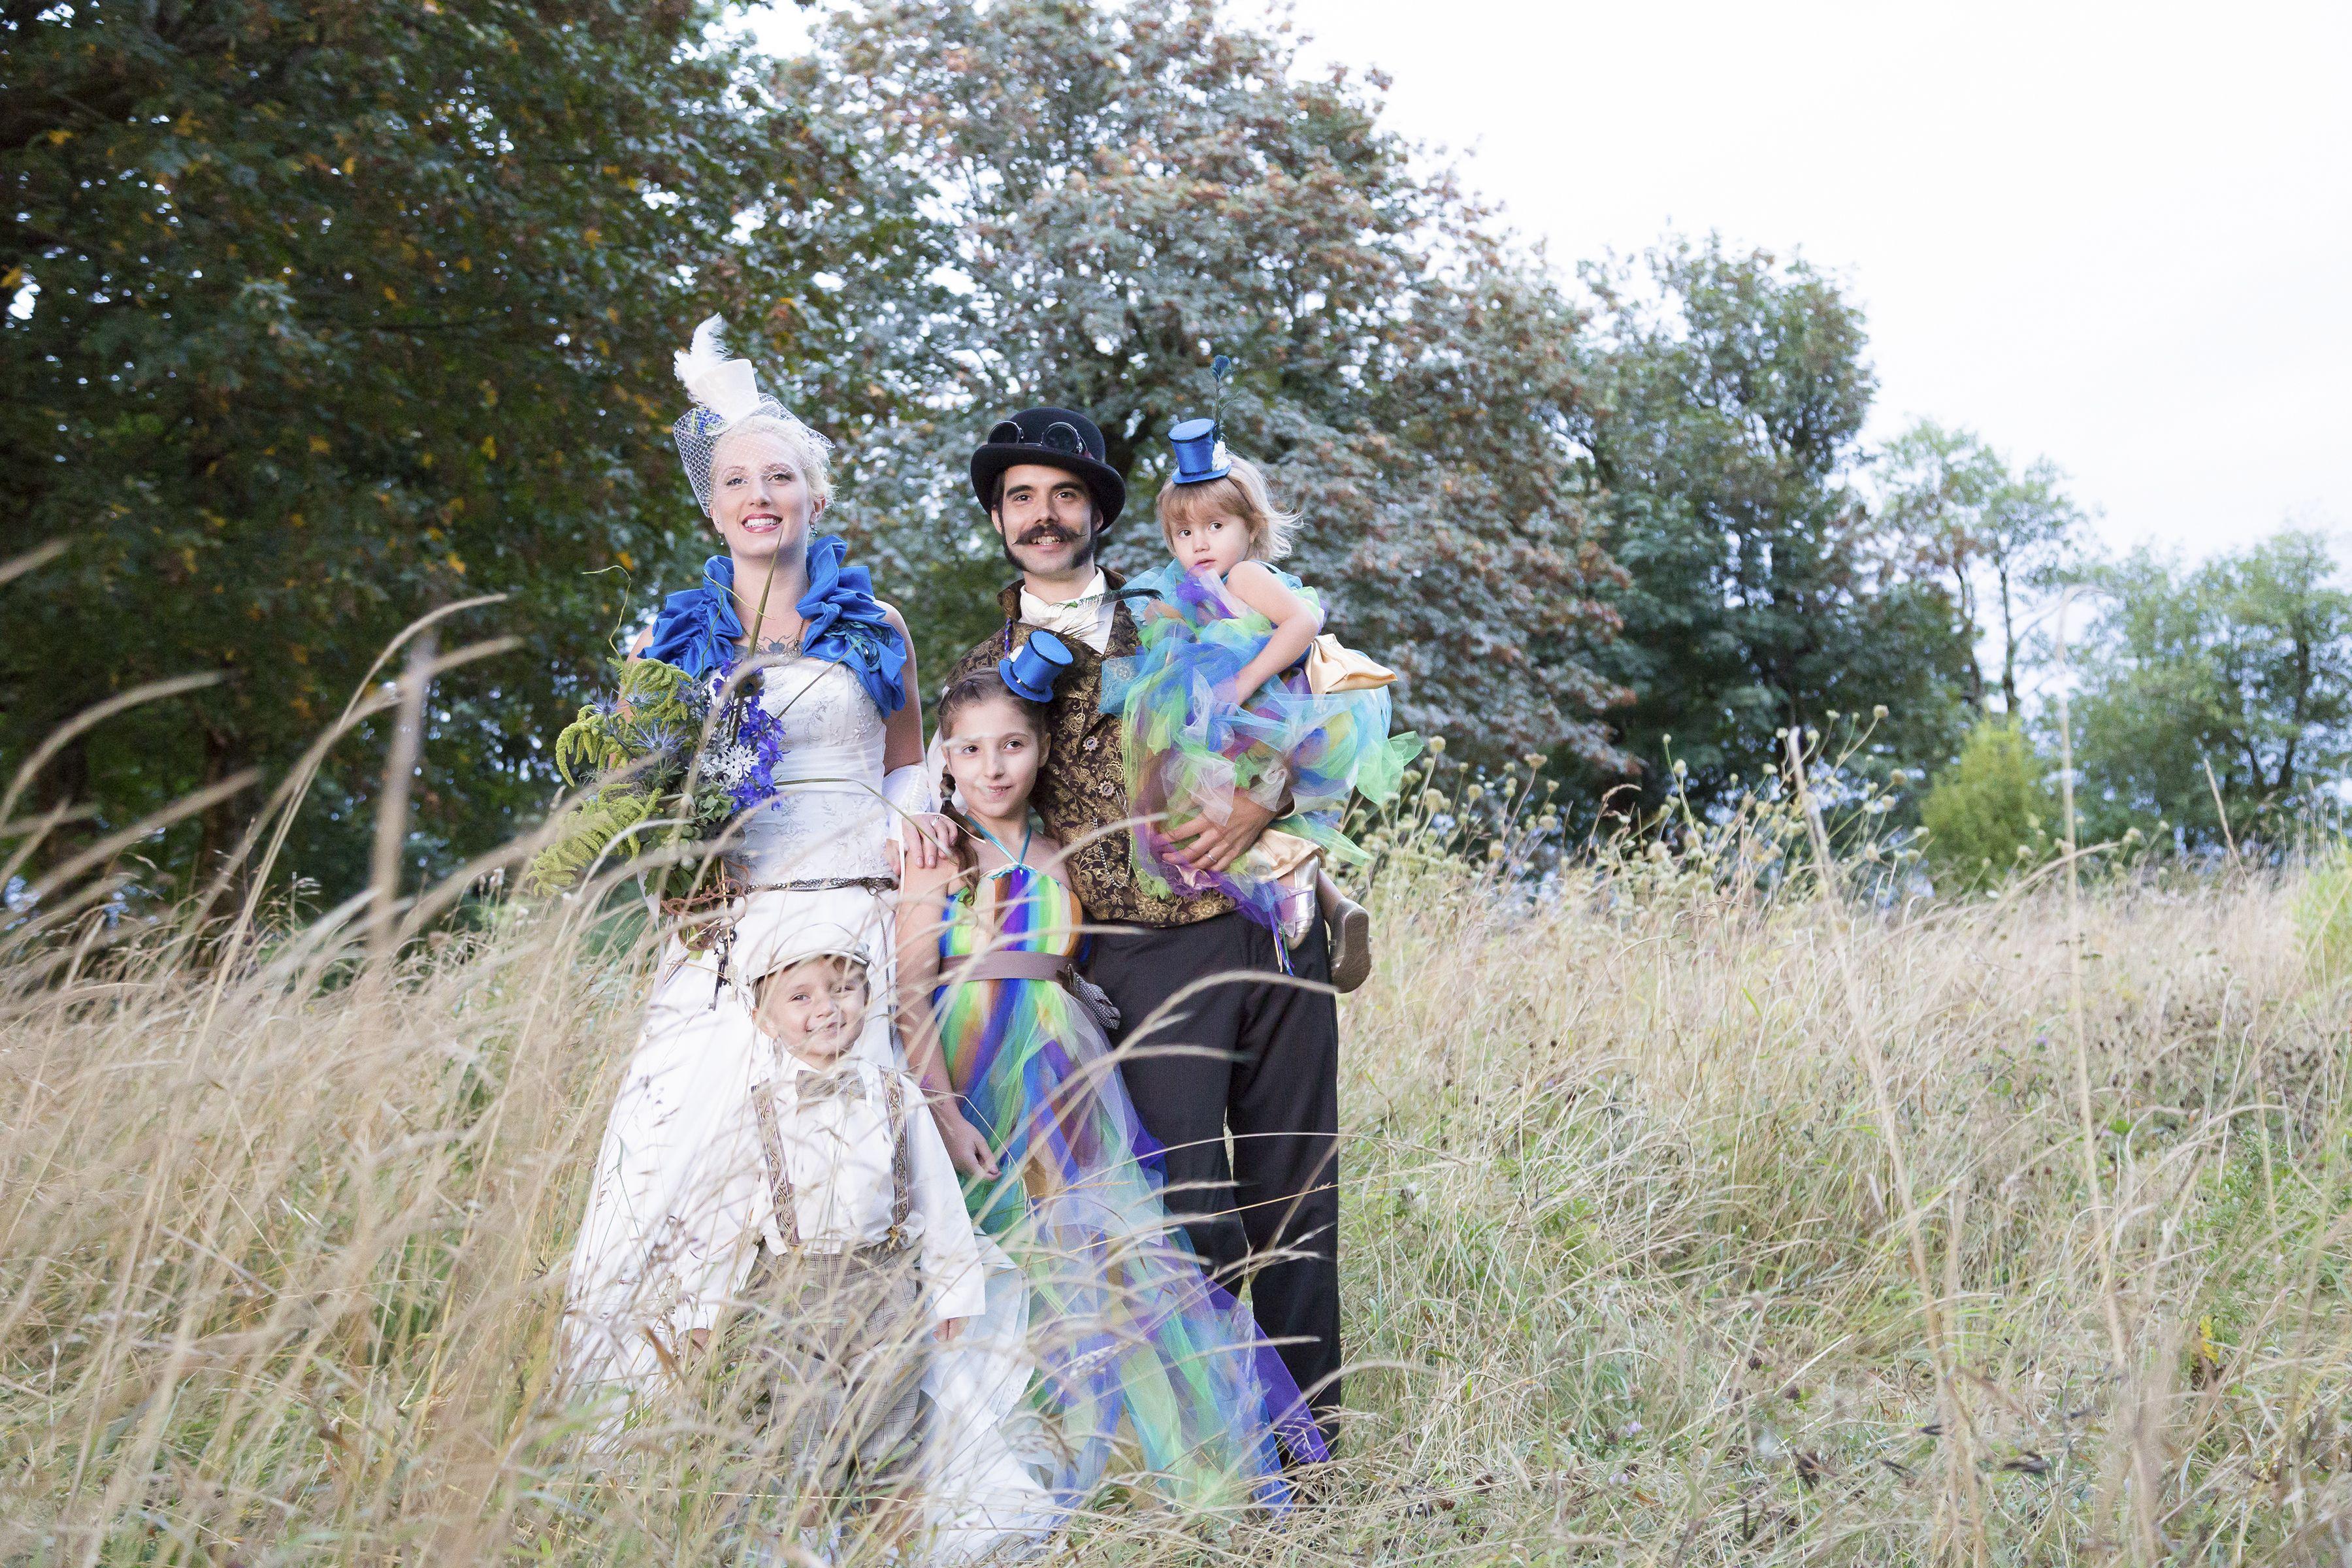 Steampunk Wedding. With the Kiddos.